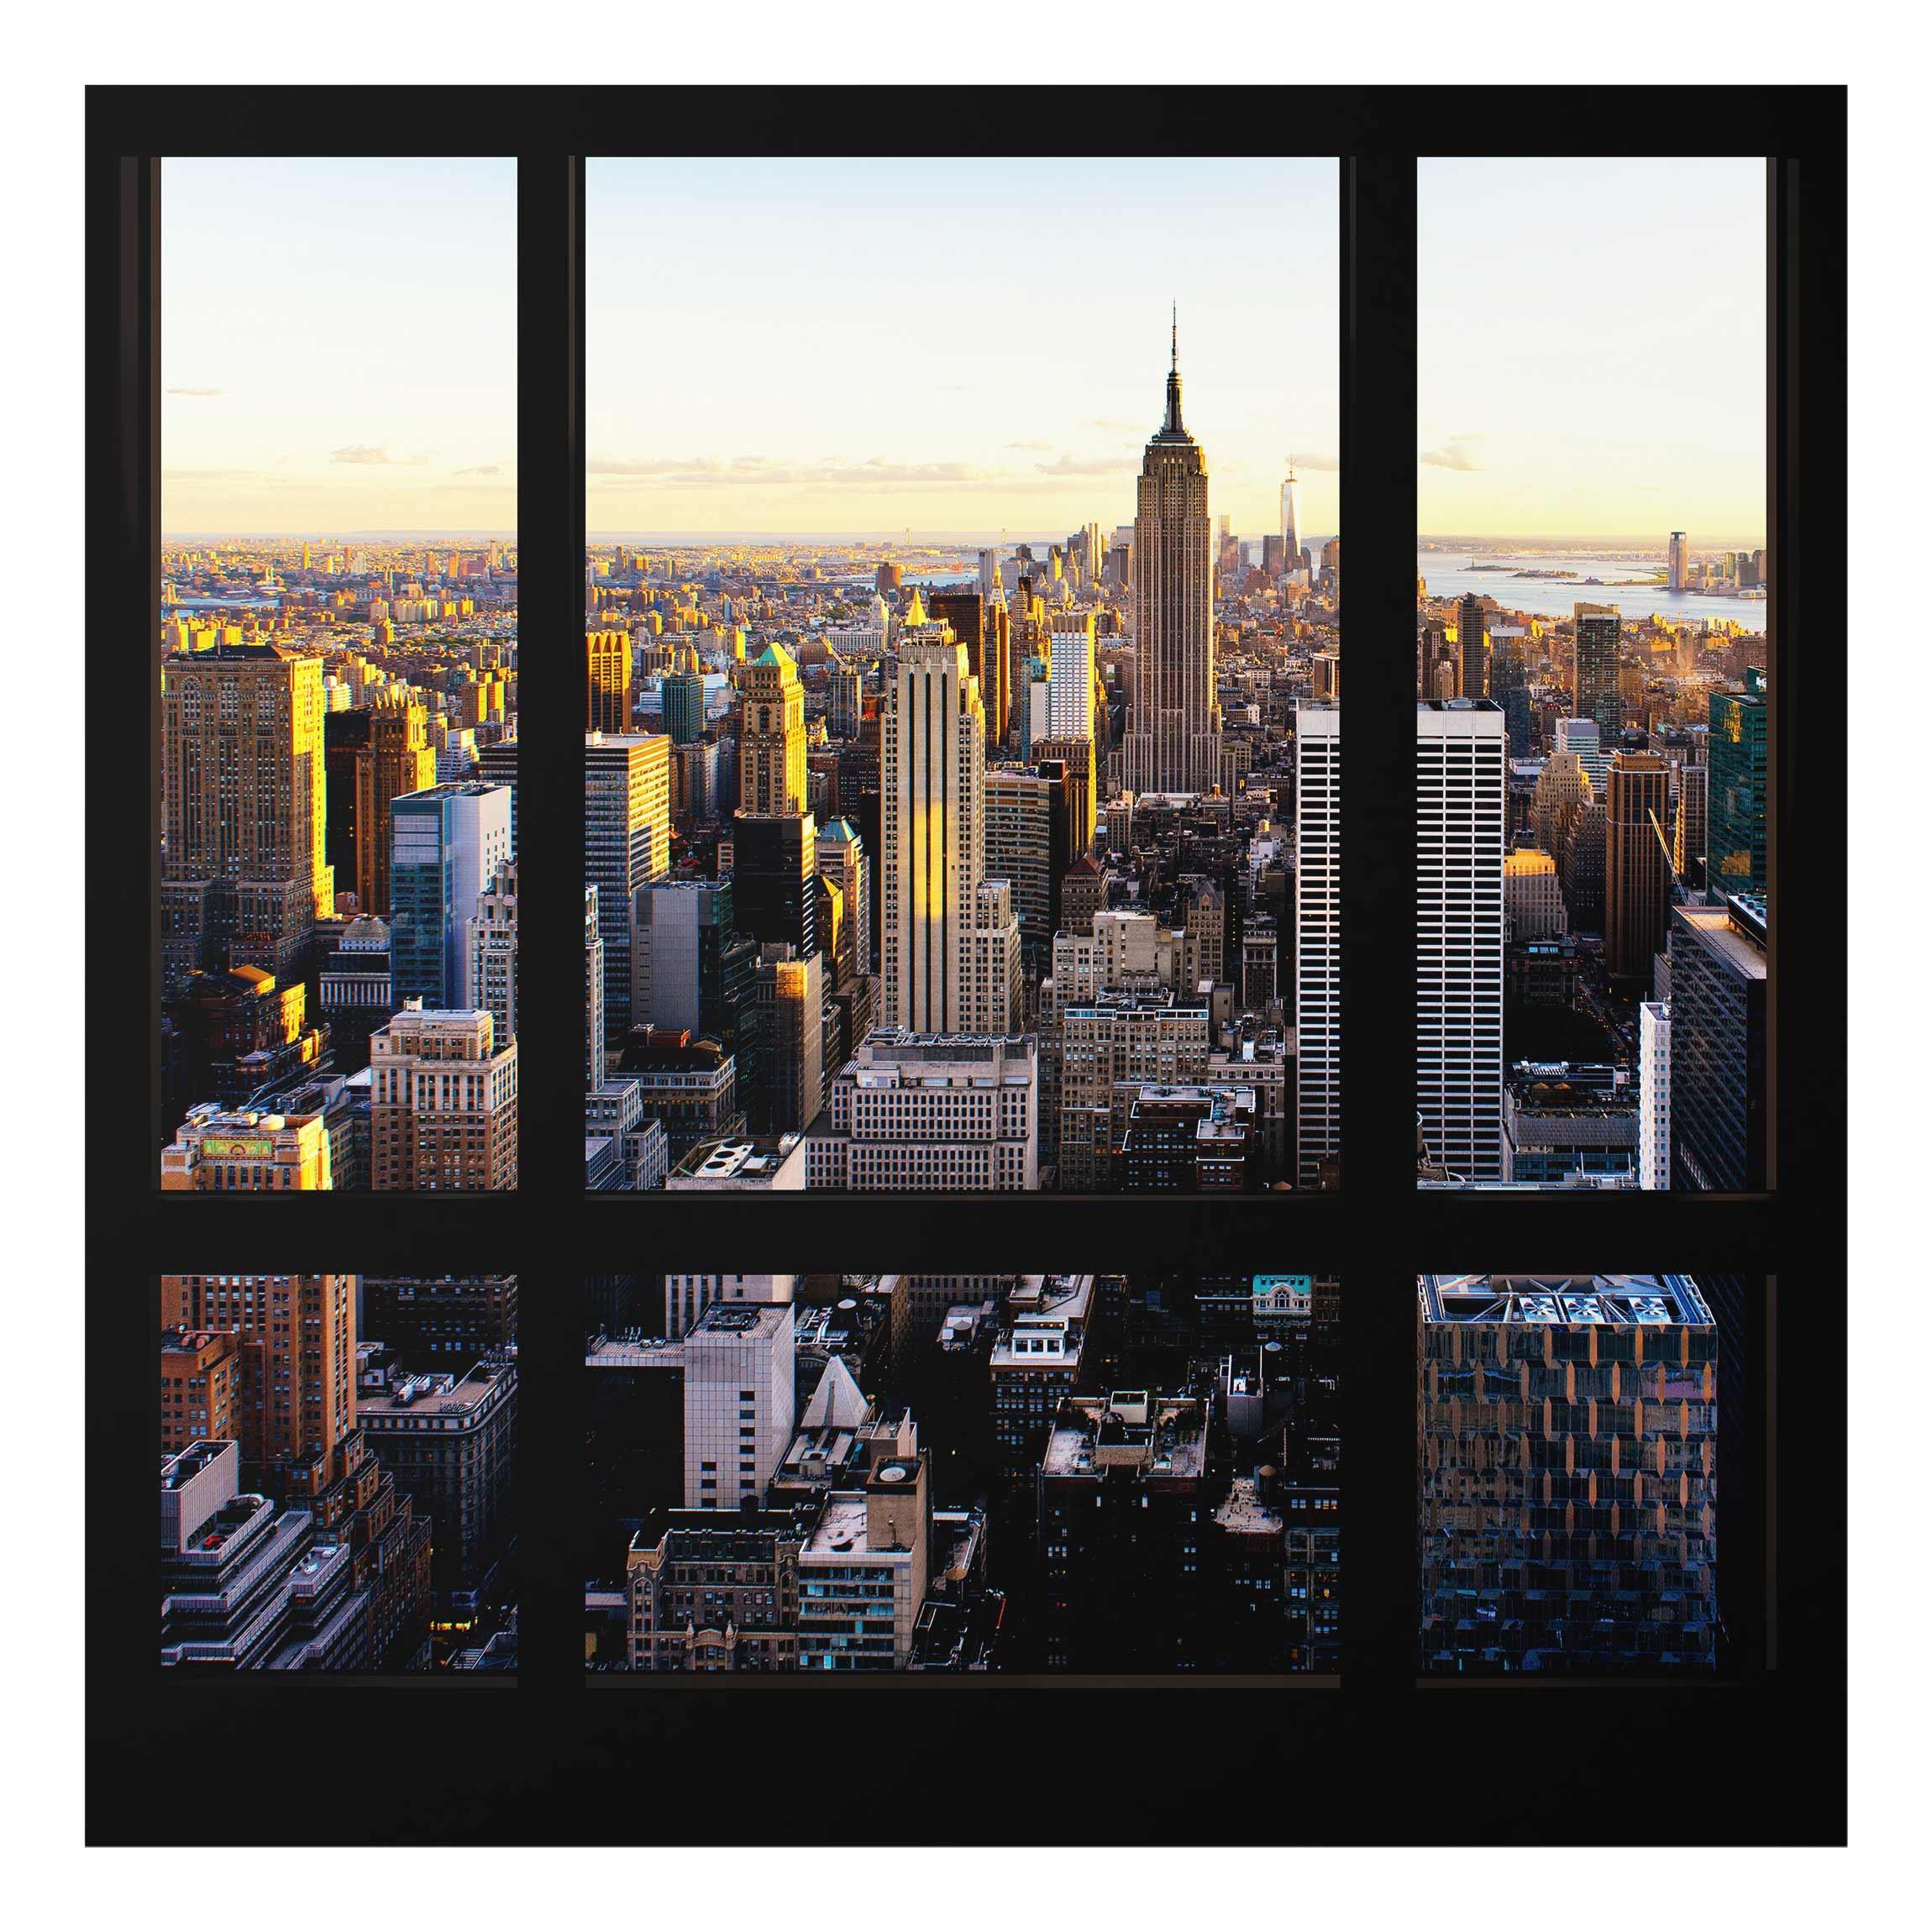 glasbild fensterblick am abend ber new york quadrat 1 1. Black Bedroom Furniture Sets. Home Design Ideas